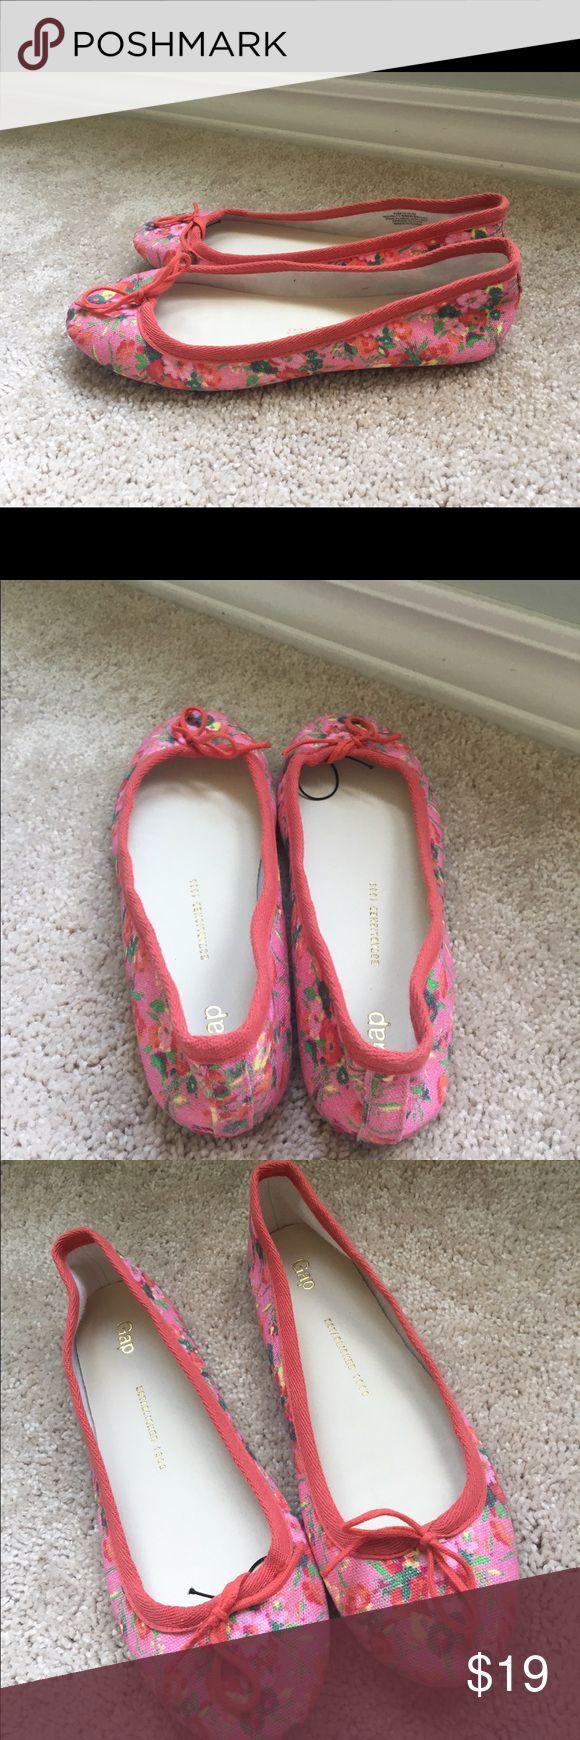 Gap floral slip ons Gap floral slippers, pink, orange GAP Shoes Flats & Loafers